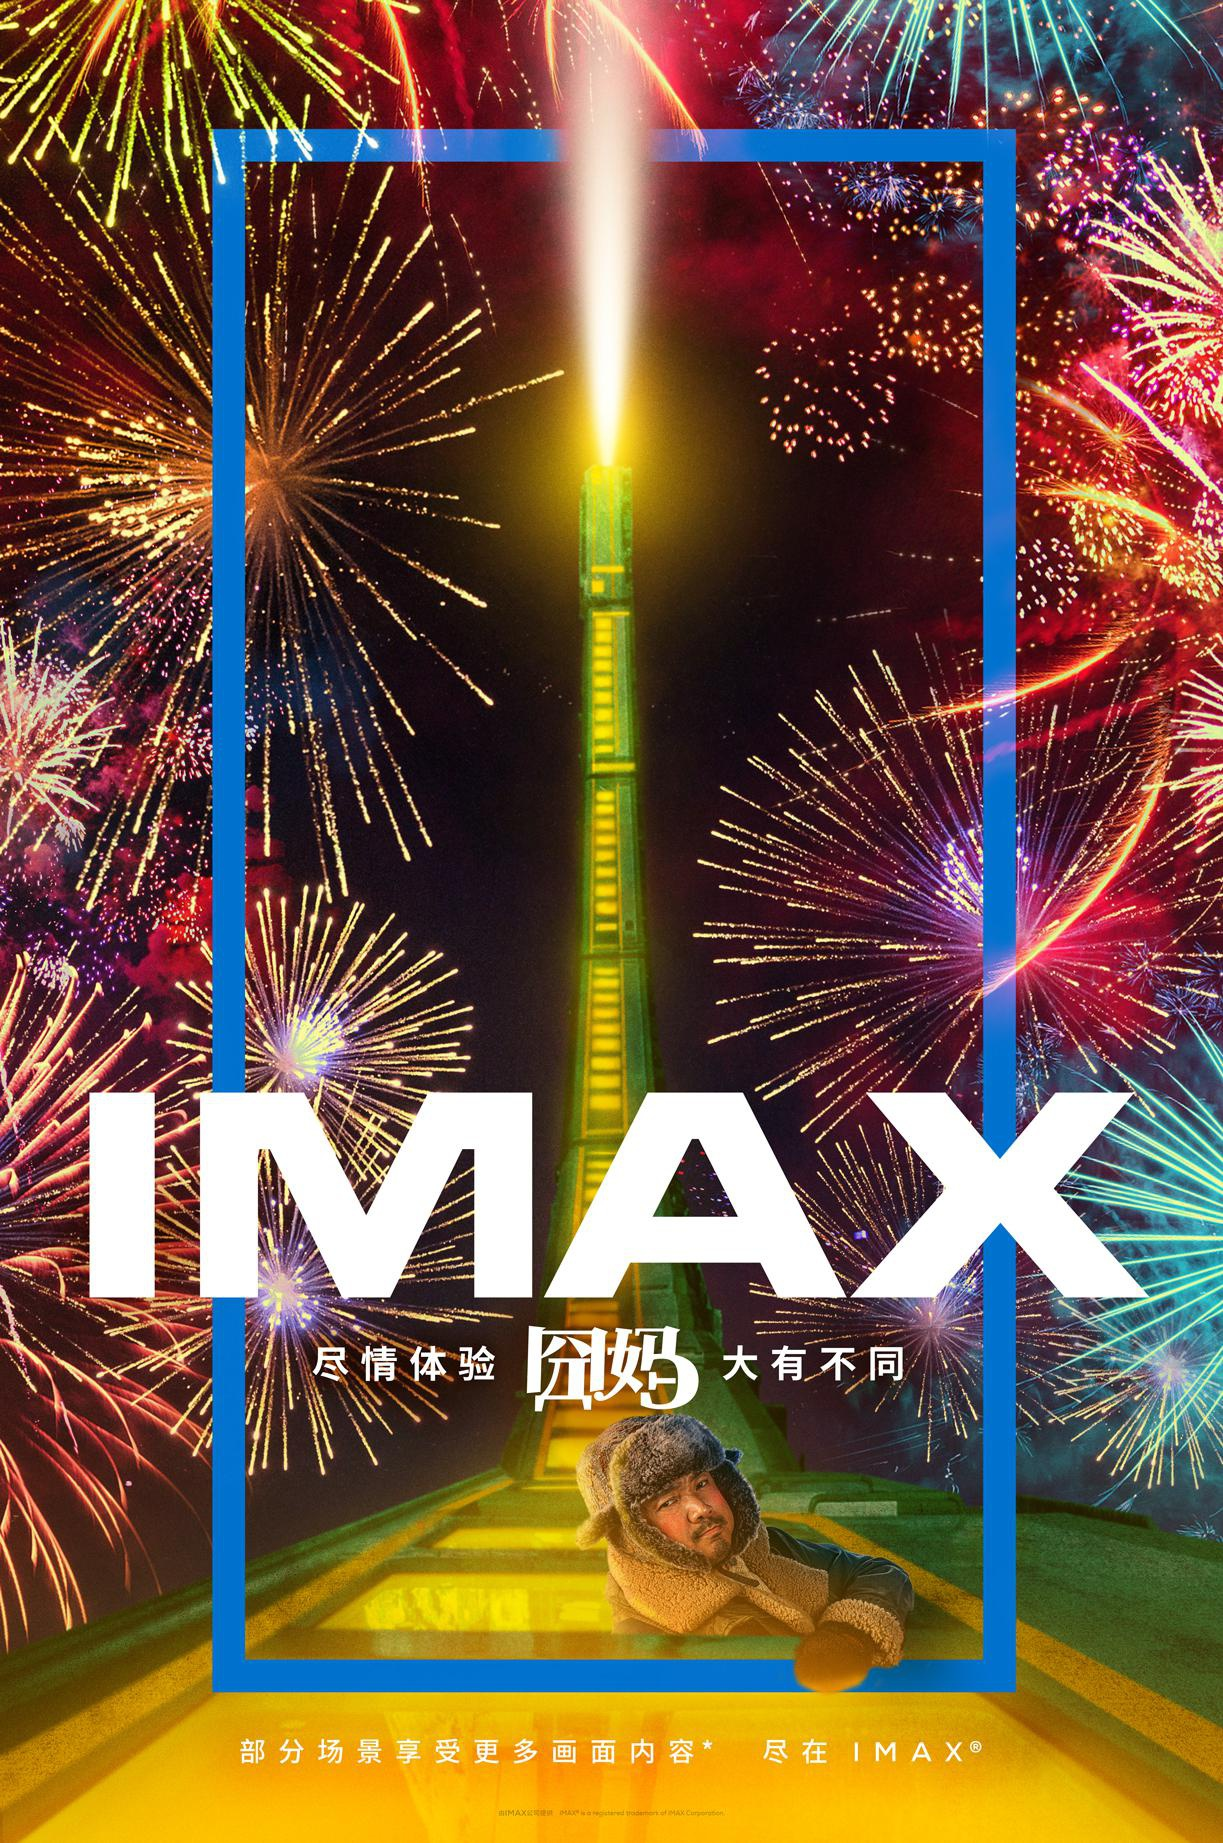 IMAX发布《囧妈》主创特辑 徐峥力荐看《囧妈》非IMAX莫属